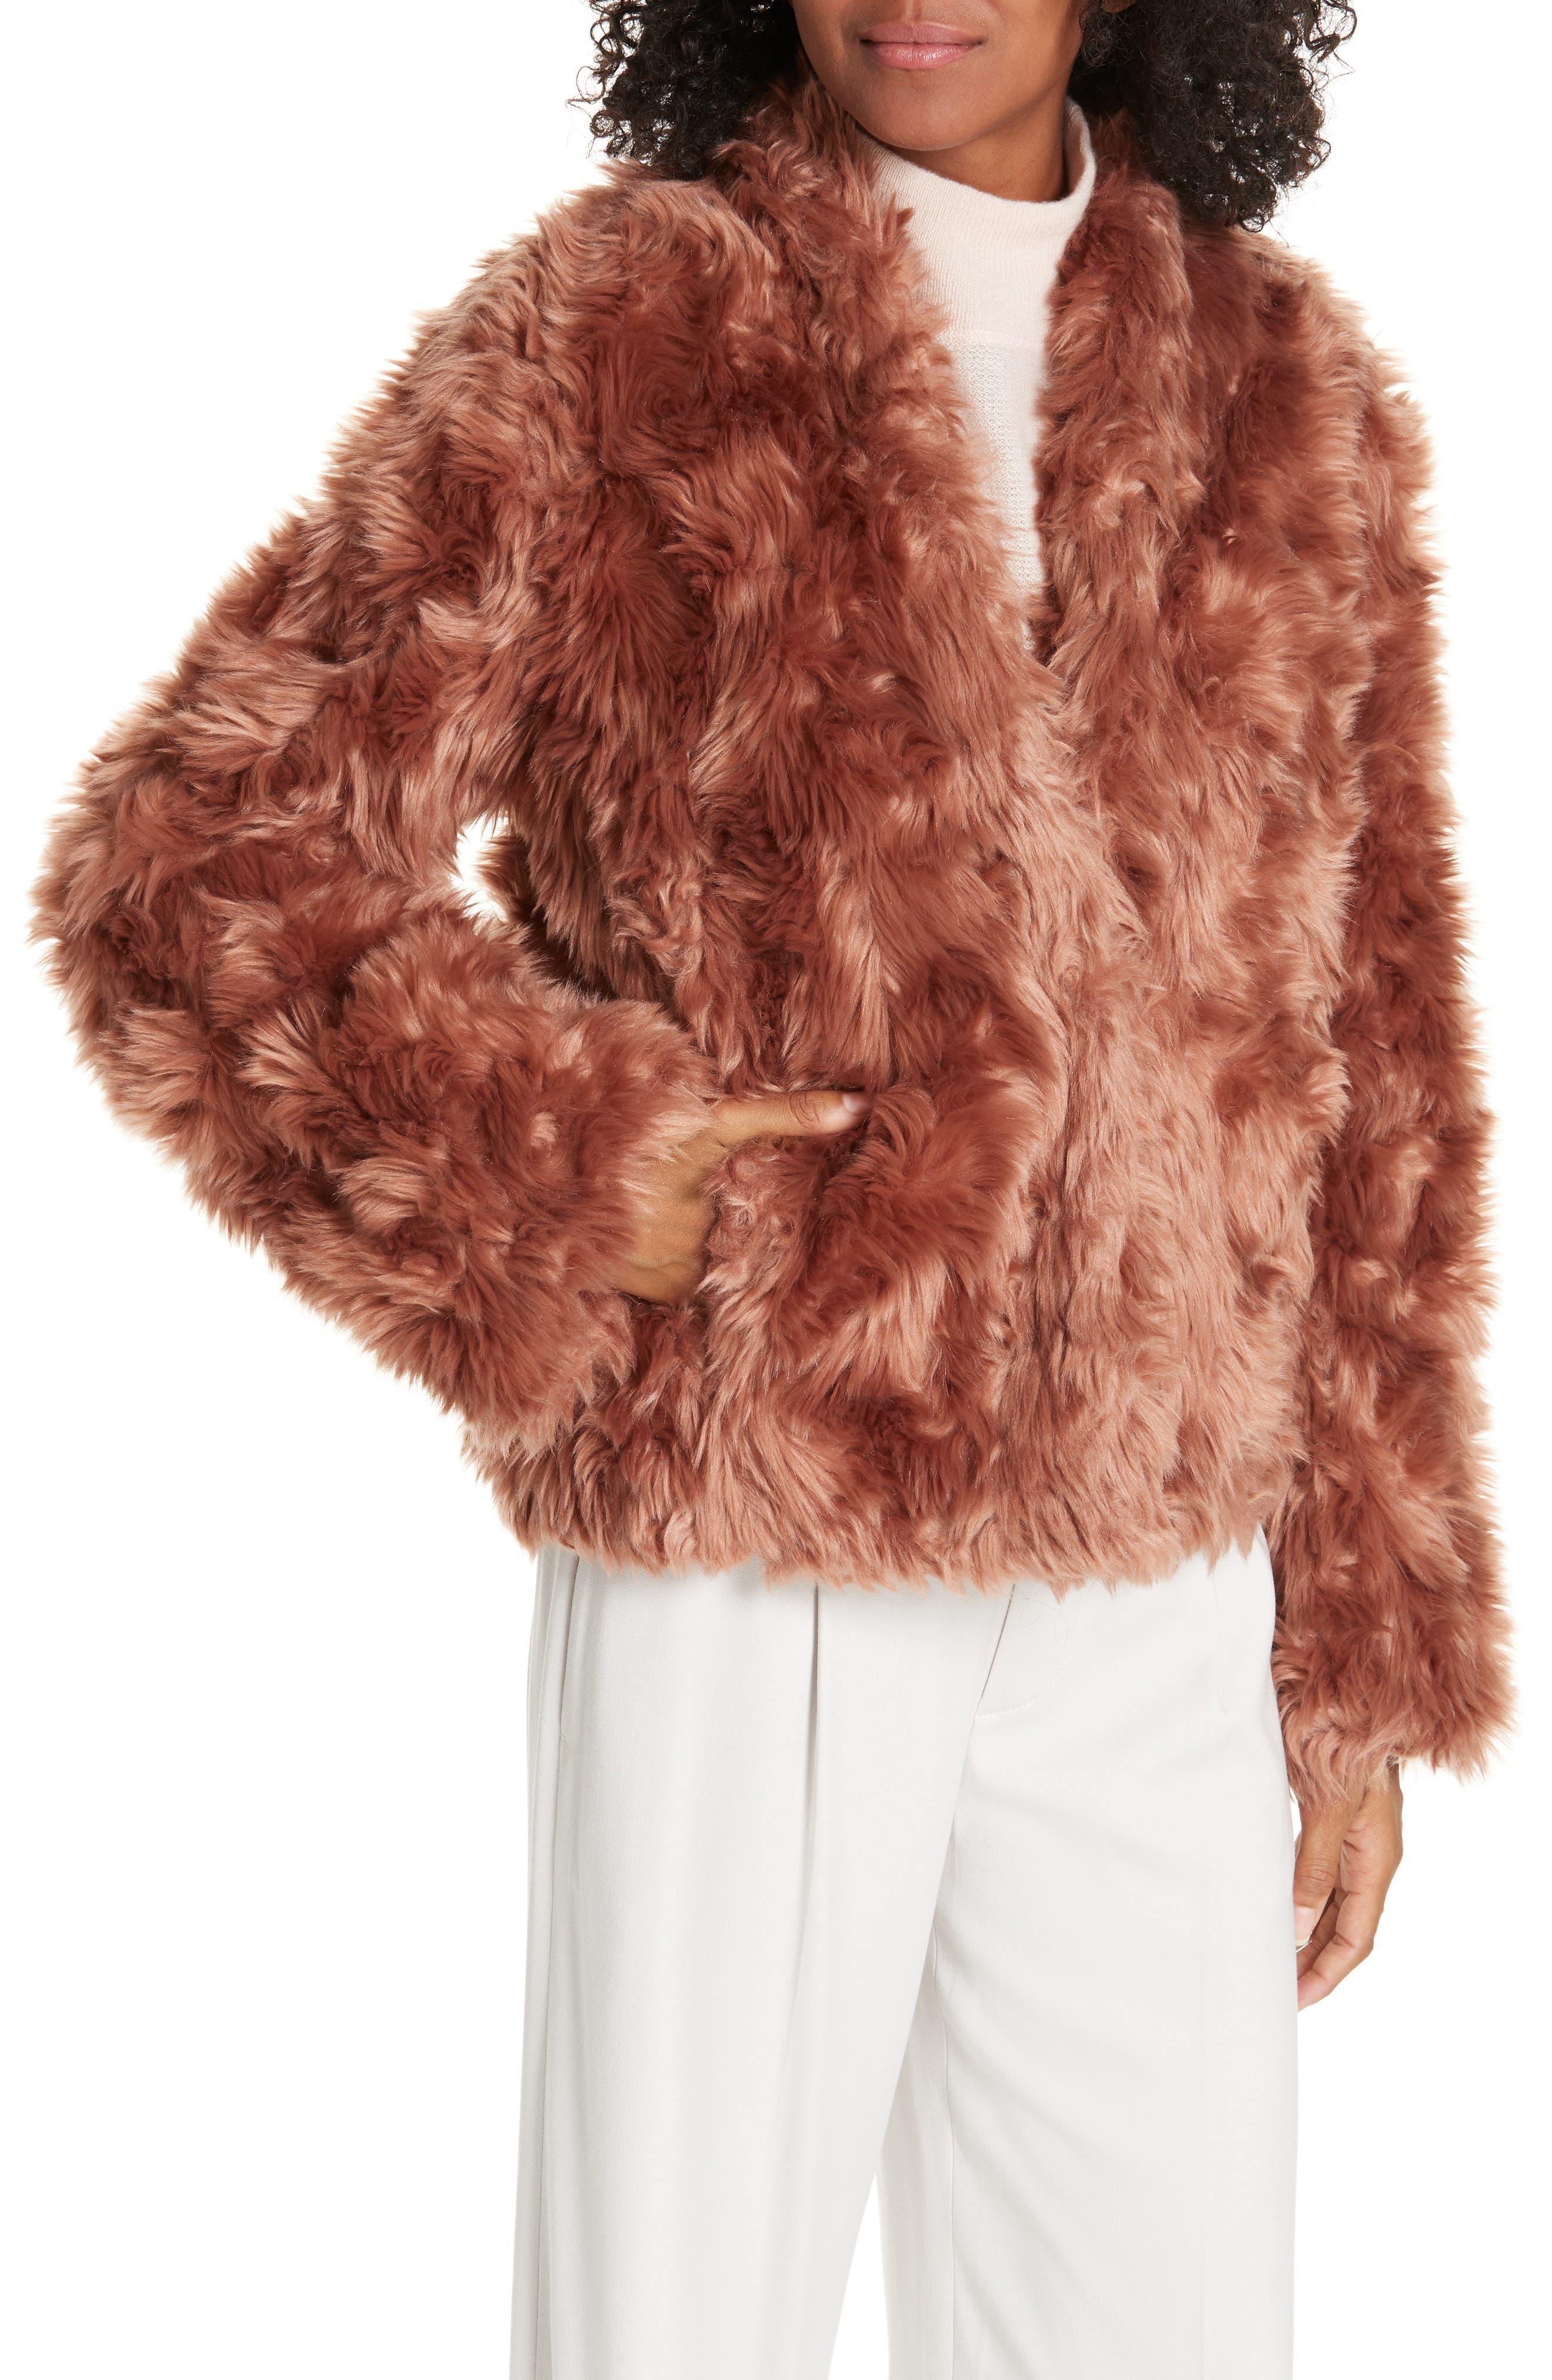 VINCE, Plush Faux Fur Jacket, Alternate thumbnail 5, color, PINK UMBER